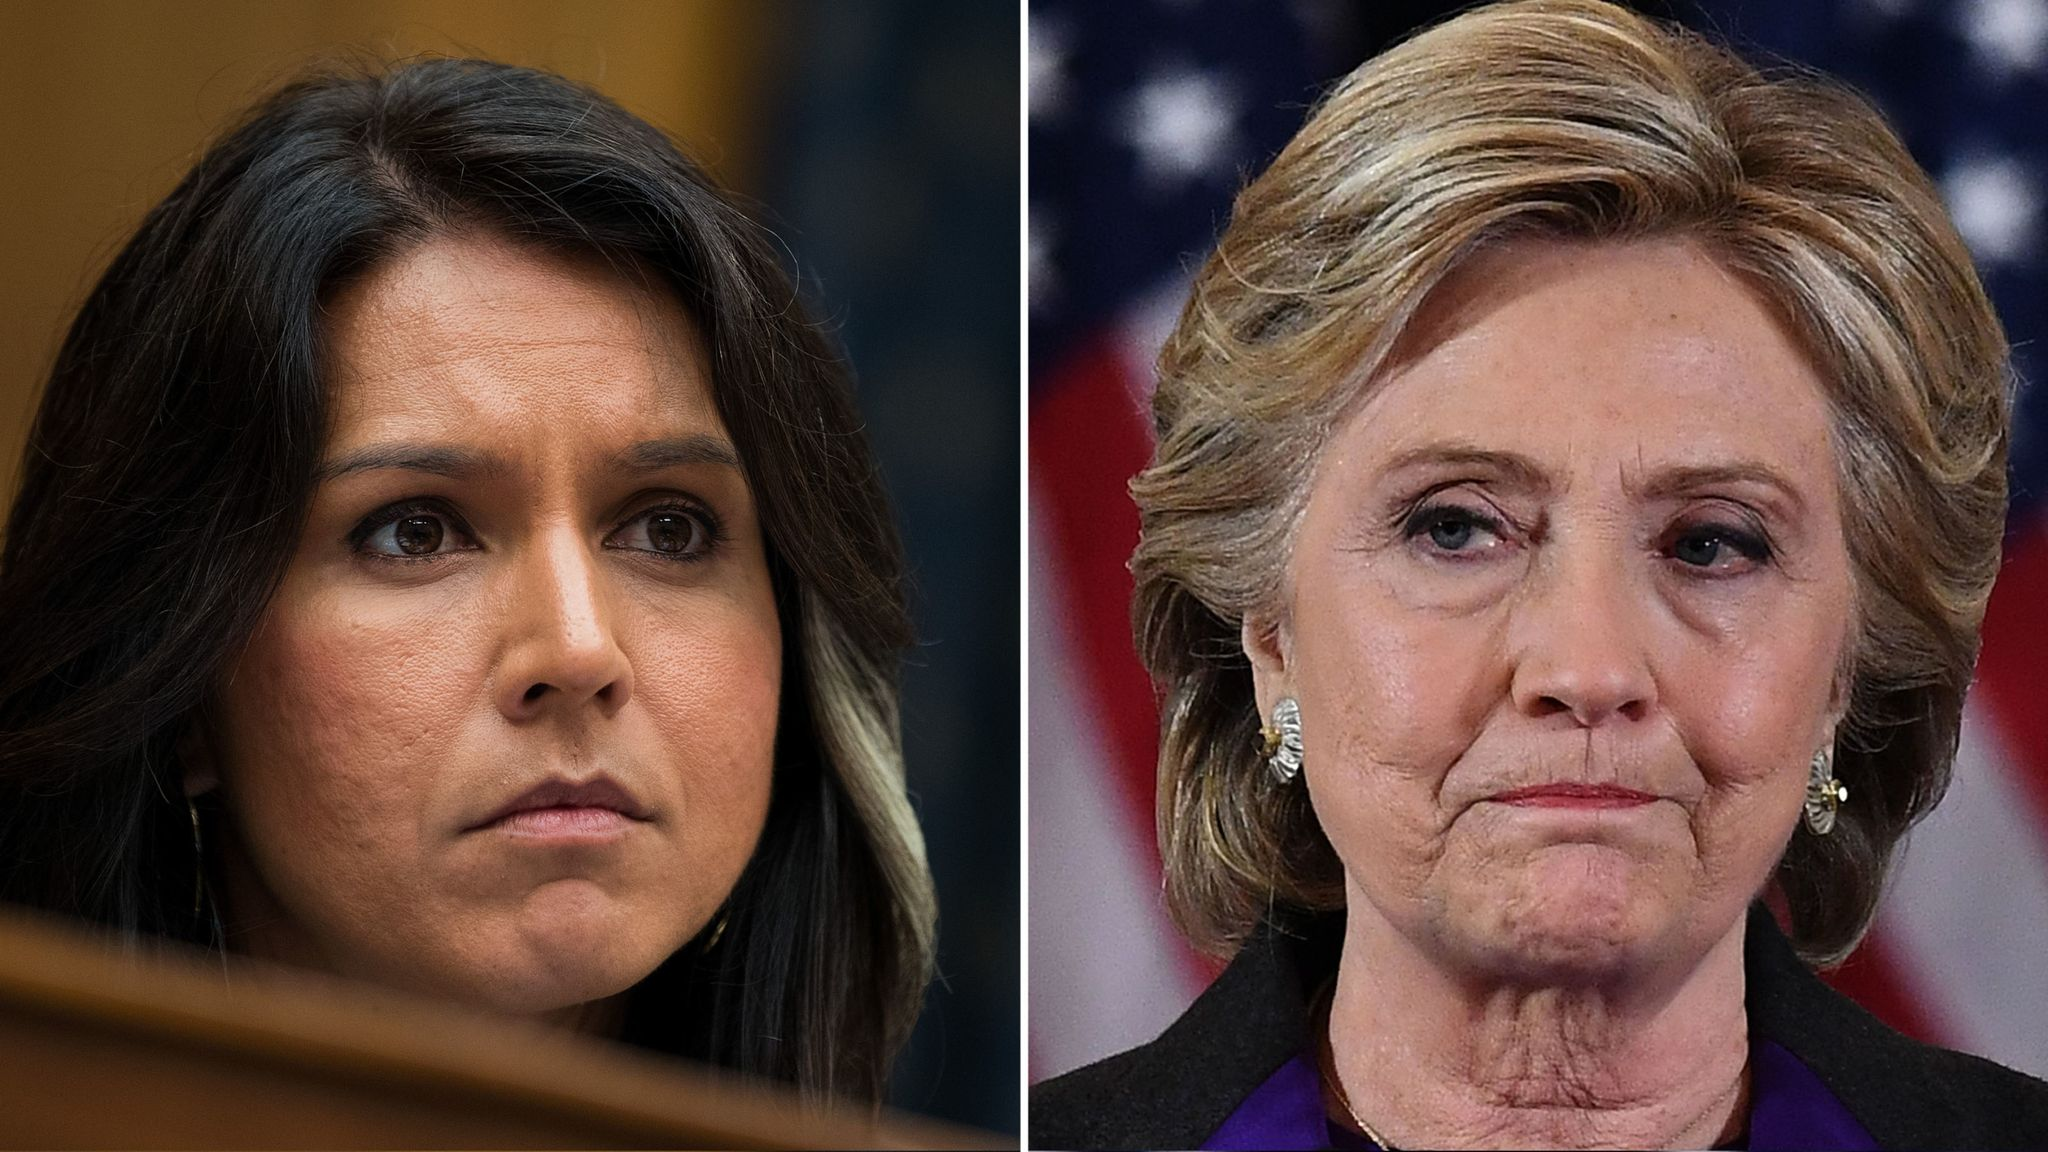 Democratic candidate Tulsi Gabbard calls Hillary Clinton 'embodiment of corruption' over Russia-bots slur